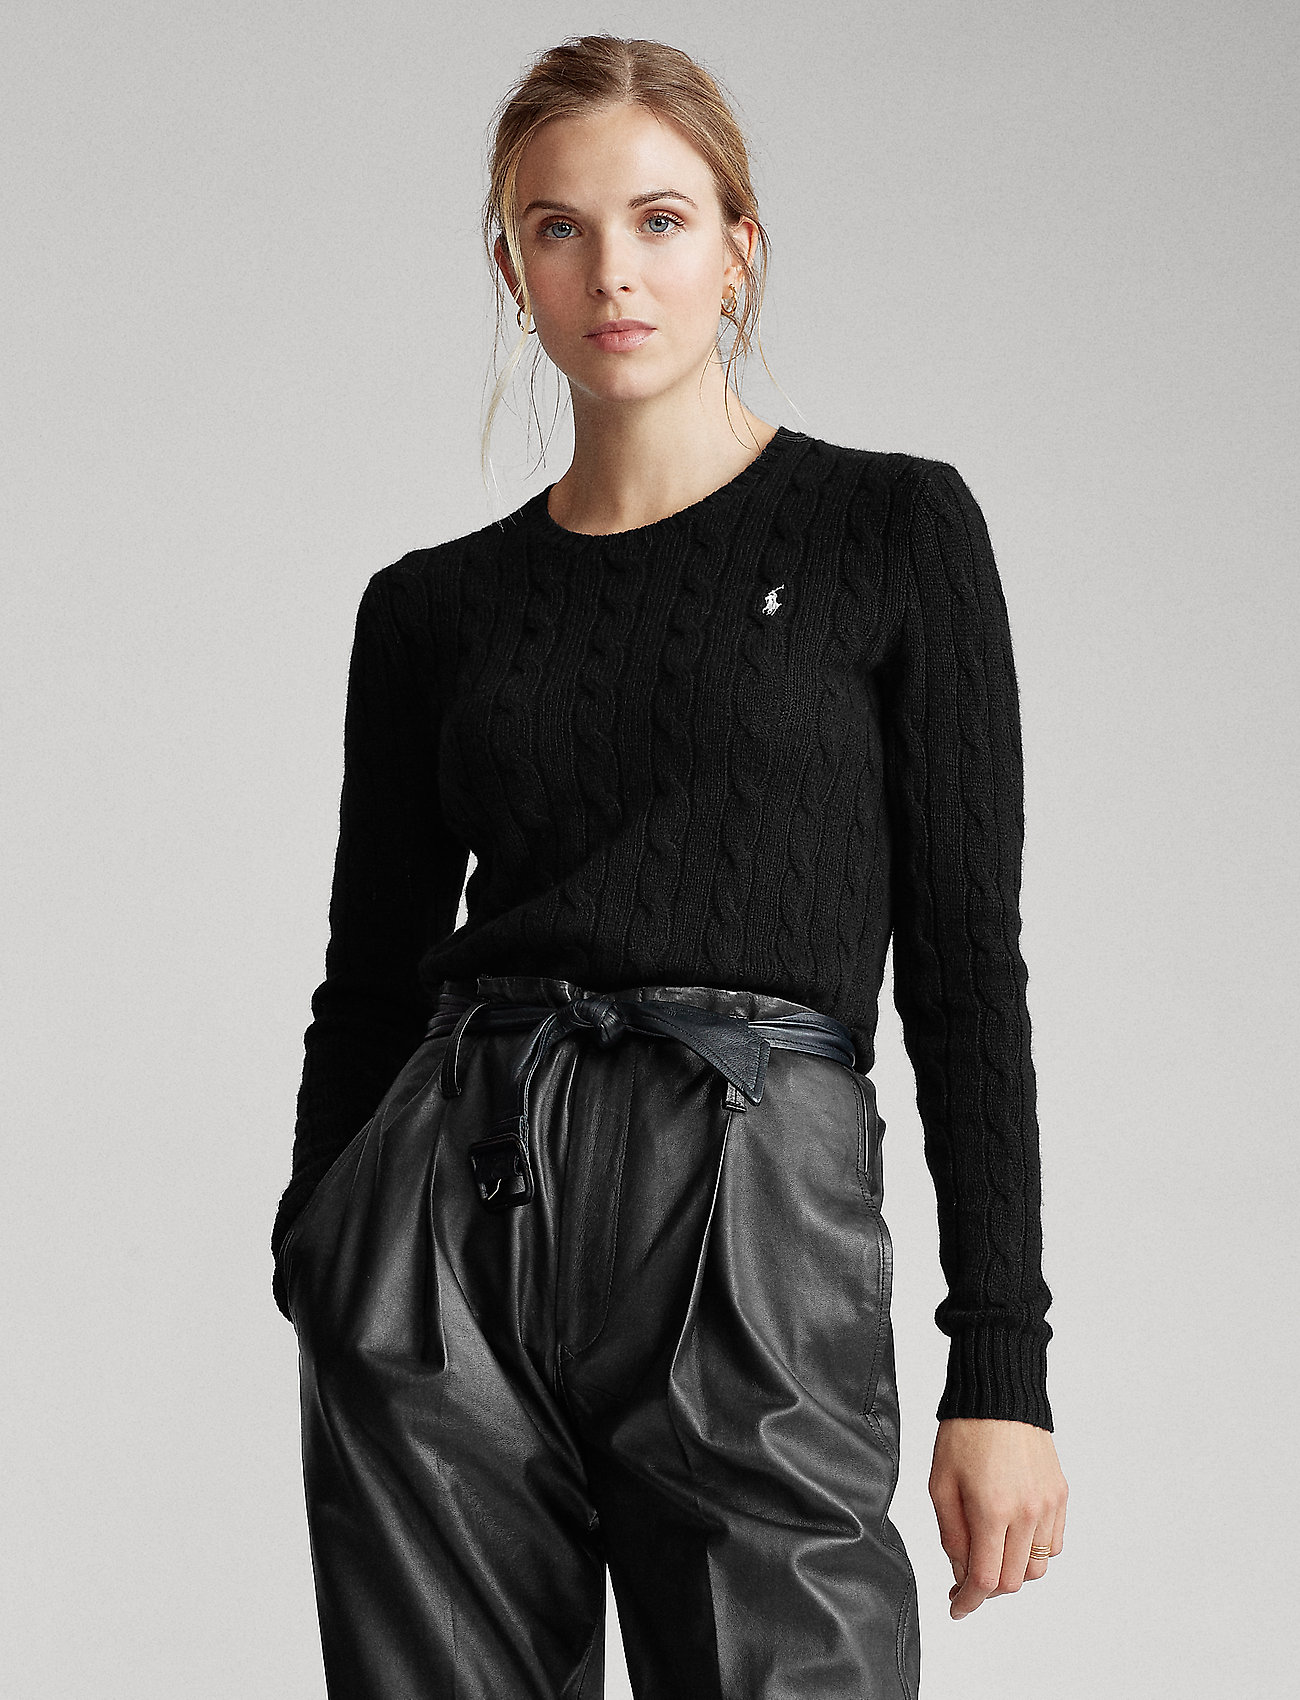 Polo Ralph Lauren - Wool-Cashmere Crewneck Sweater - polo black - 0